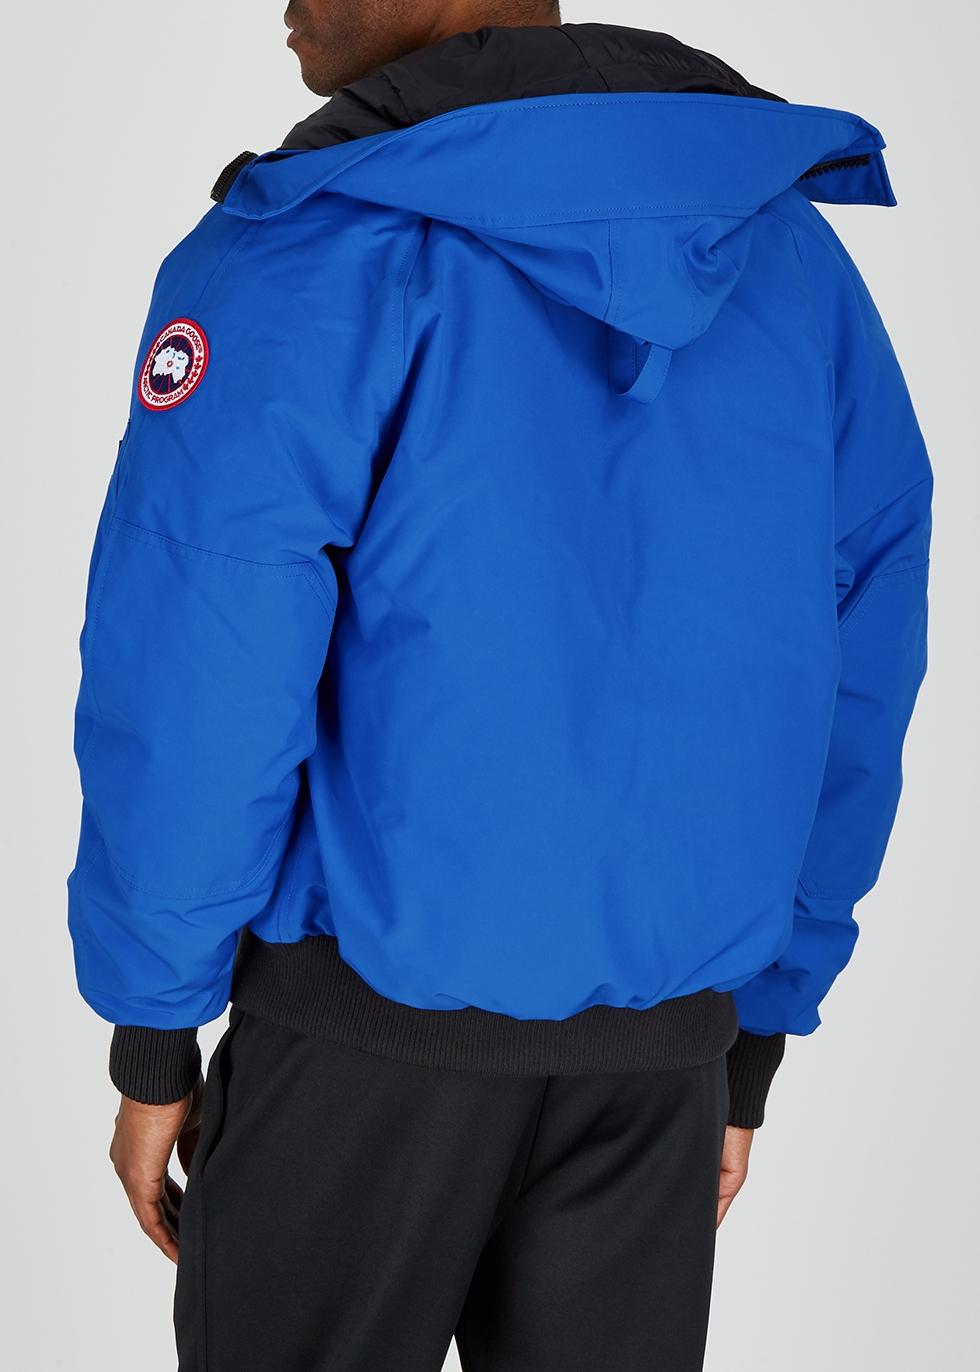 Canada Goose Chilliwack PBI blue fur trimmed shell coat